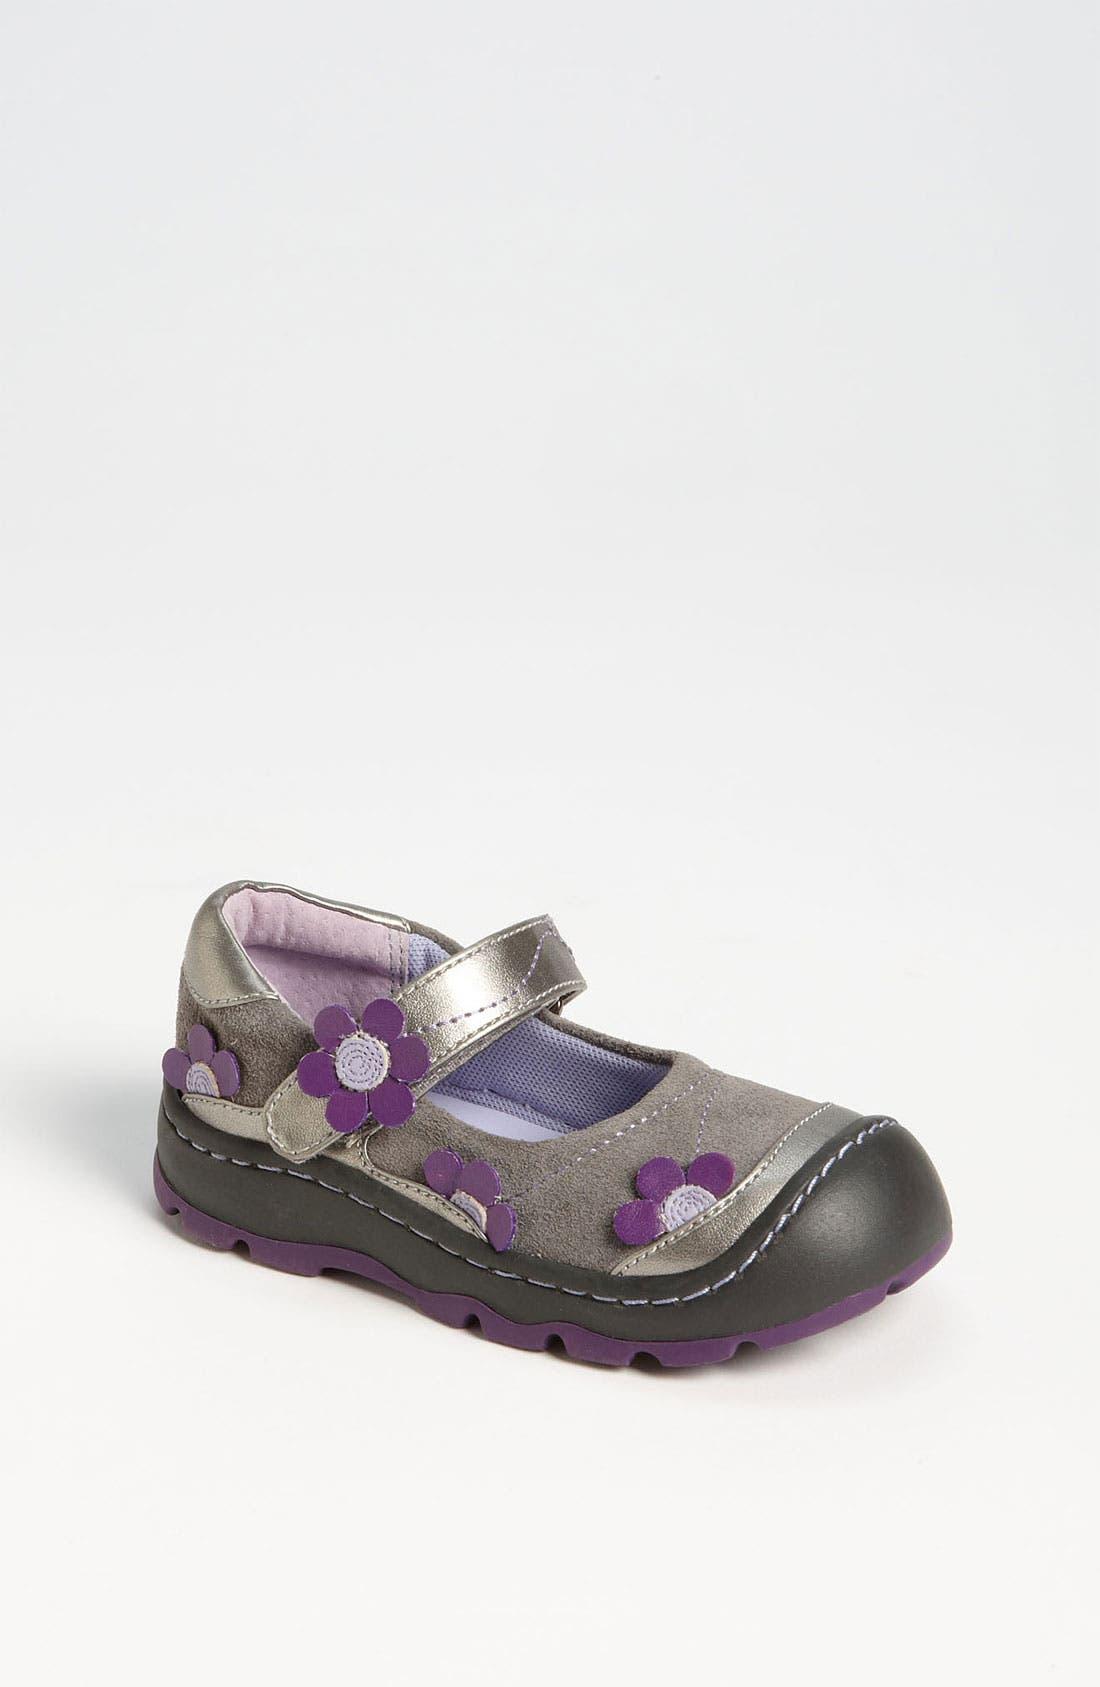 Alternate Image 1 Selected - Jumping Jacks 'Flower Breeze' Slip-On (Walker & Toddler)